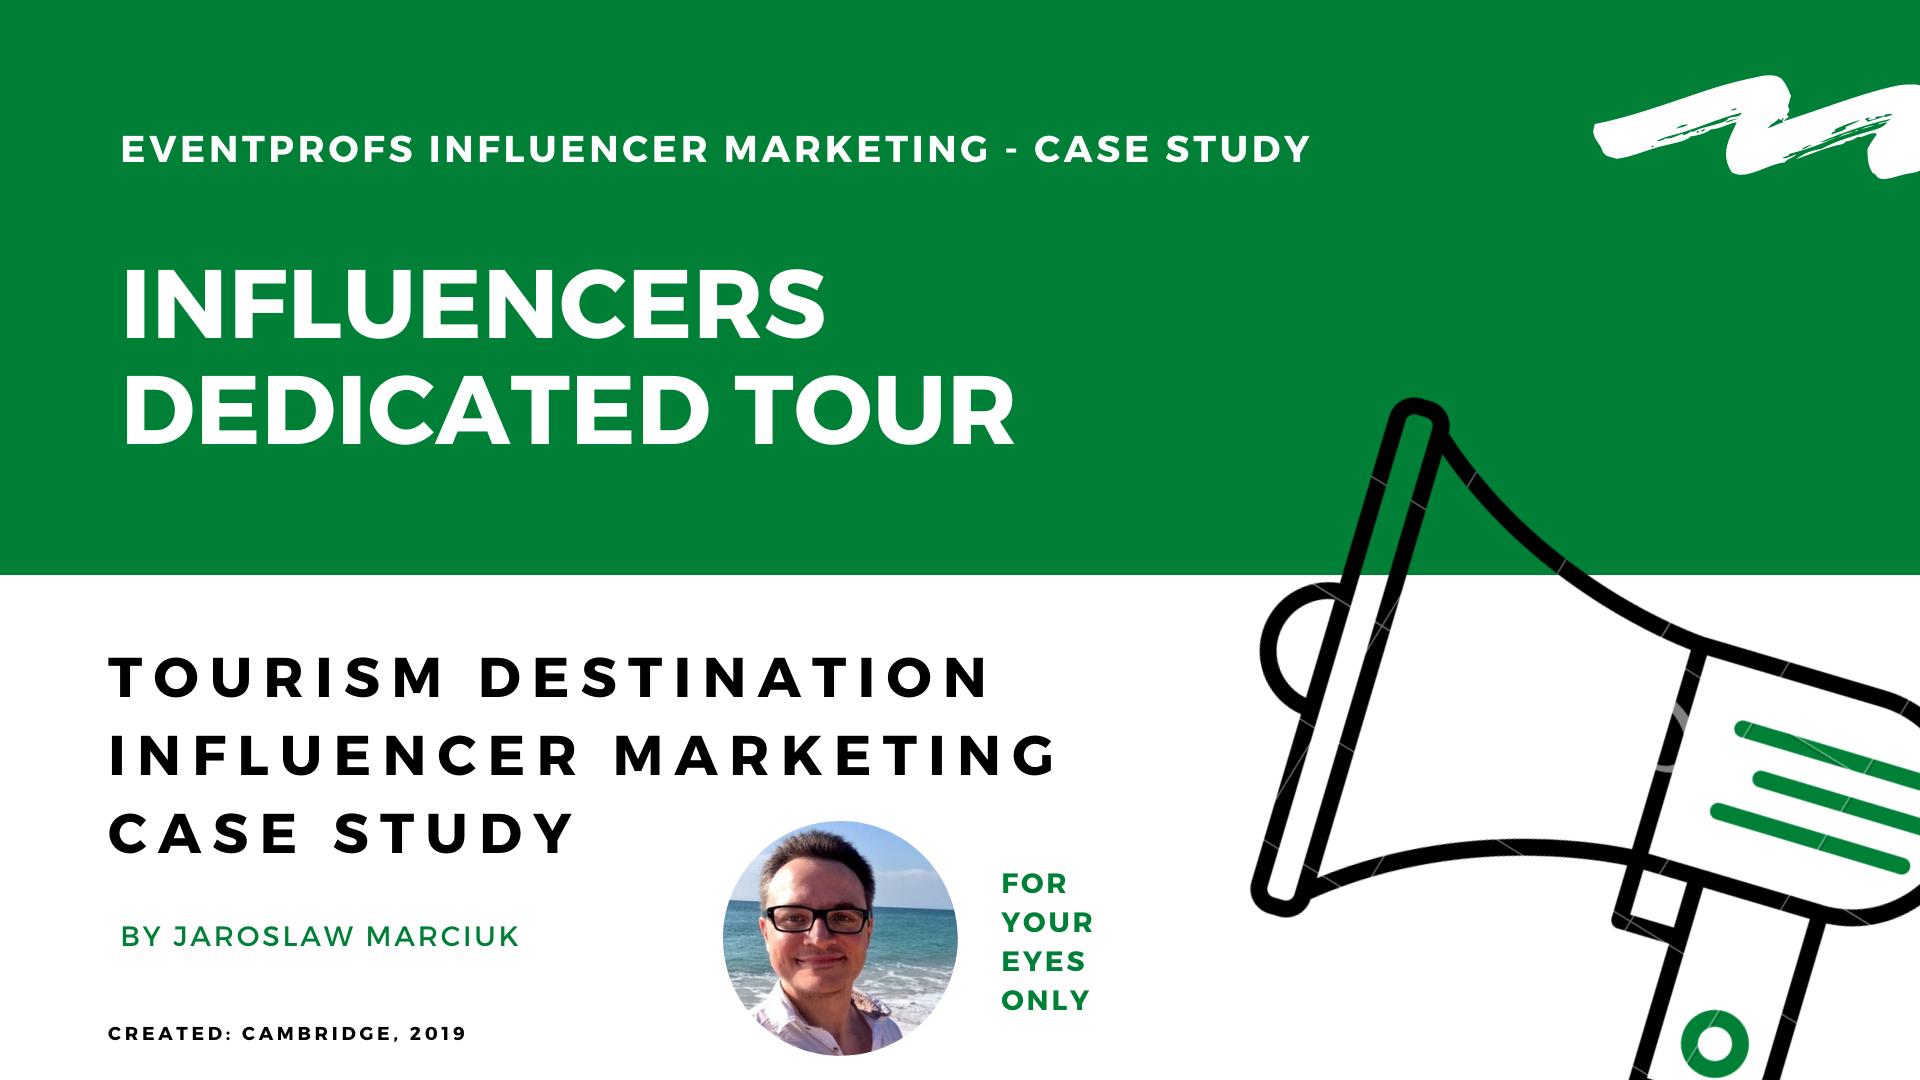 inflluencer marketing campaign destination case study tourism board